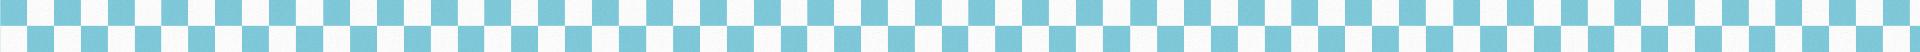 Aménagement de jardin Aquitaine, Aménagement de jardin Bordeaux, Aménagement de jardin Gironde, Antiquaire Aquitaine, Antiquaire Bordeaux, Antiquaire Gironde, Antiquités Aquitaine, Antiquités Bordeaux, Antiquités Gironde, Brocante Aquitaine, Brocante Bordeaux, Brocante Gironde, Débarras Aquitaine, Débarras Bordeaux, Débarras Gironde, Dépôt vente Aquitaine, Dépôt vente Bordeaux, Dépôt vente Gironde, Meubles vintage Aquitaine, Meubles vintage Bordeaux, Meubles vintage Gironde, Vetements vintage Aquitaine, Vetements vintage Bordeaux, Vetements vintage Gironde, Vide grenier Aquitaine, Vide grenier Bordeaux, Vide grenier Gironde